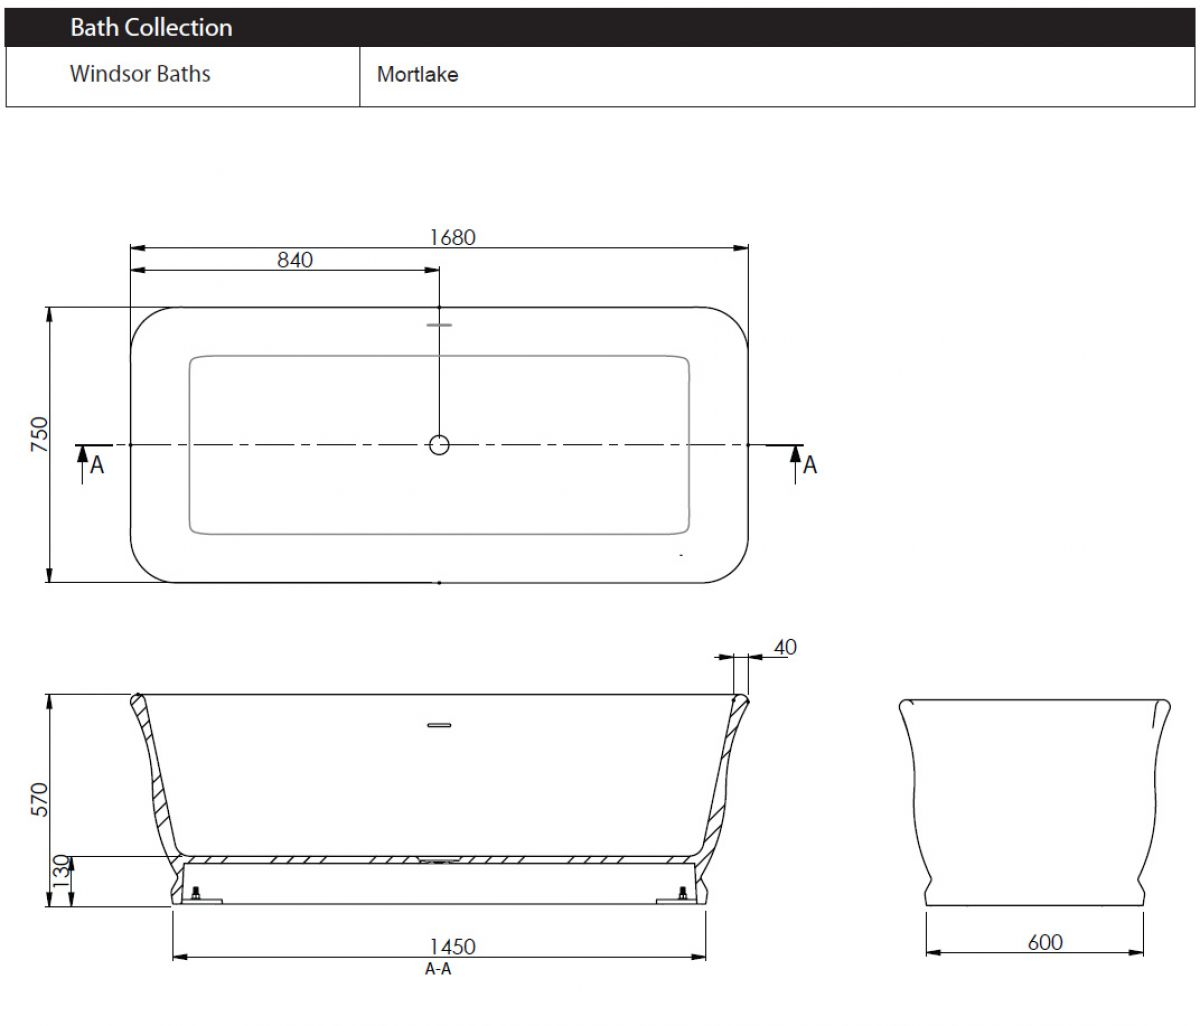 Imperial mortlake traditional freestanding bath uk bathrooms for Standard size of freestanding bathtub